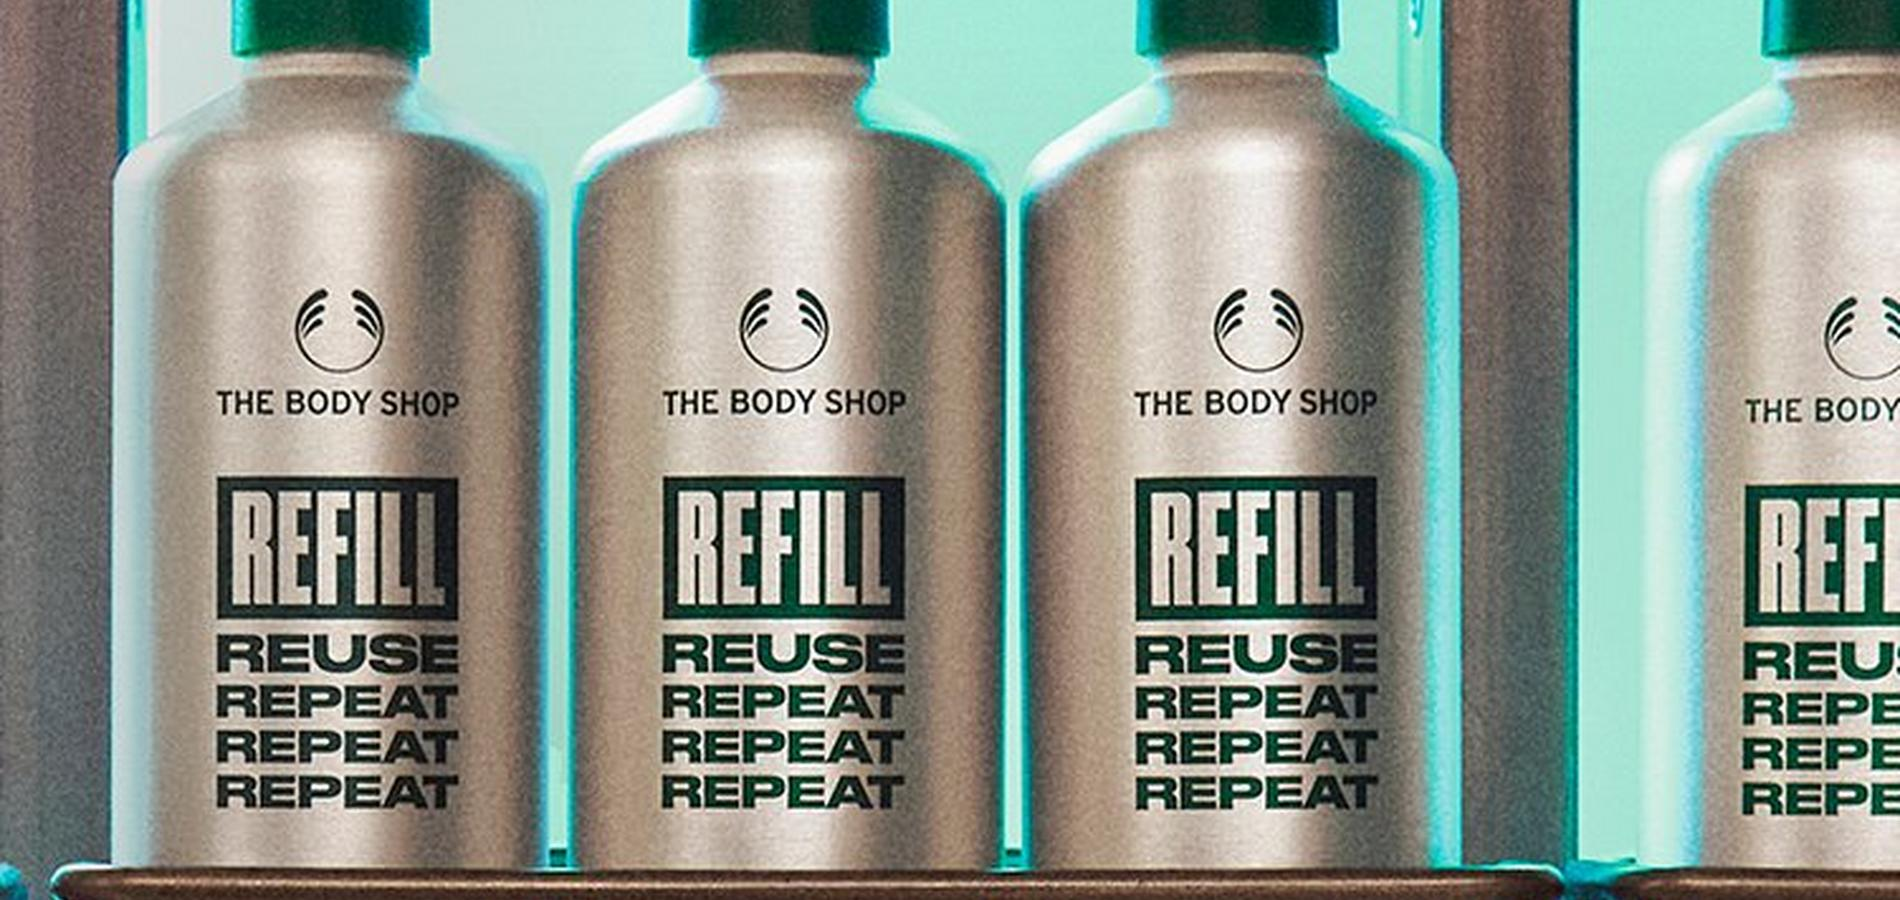 The Body Shop Refill Bottles